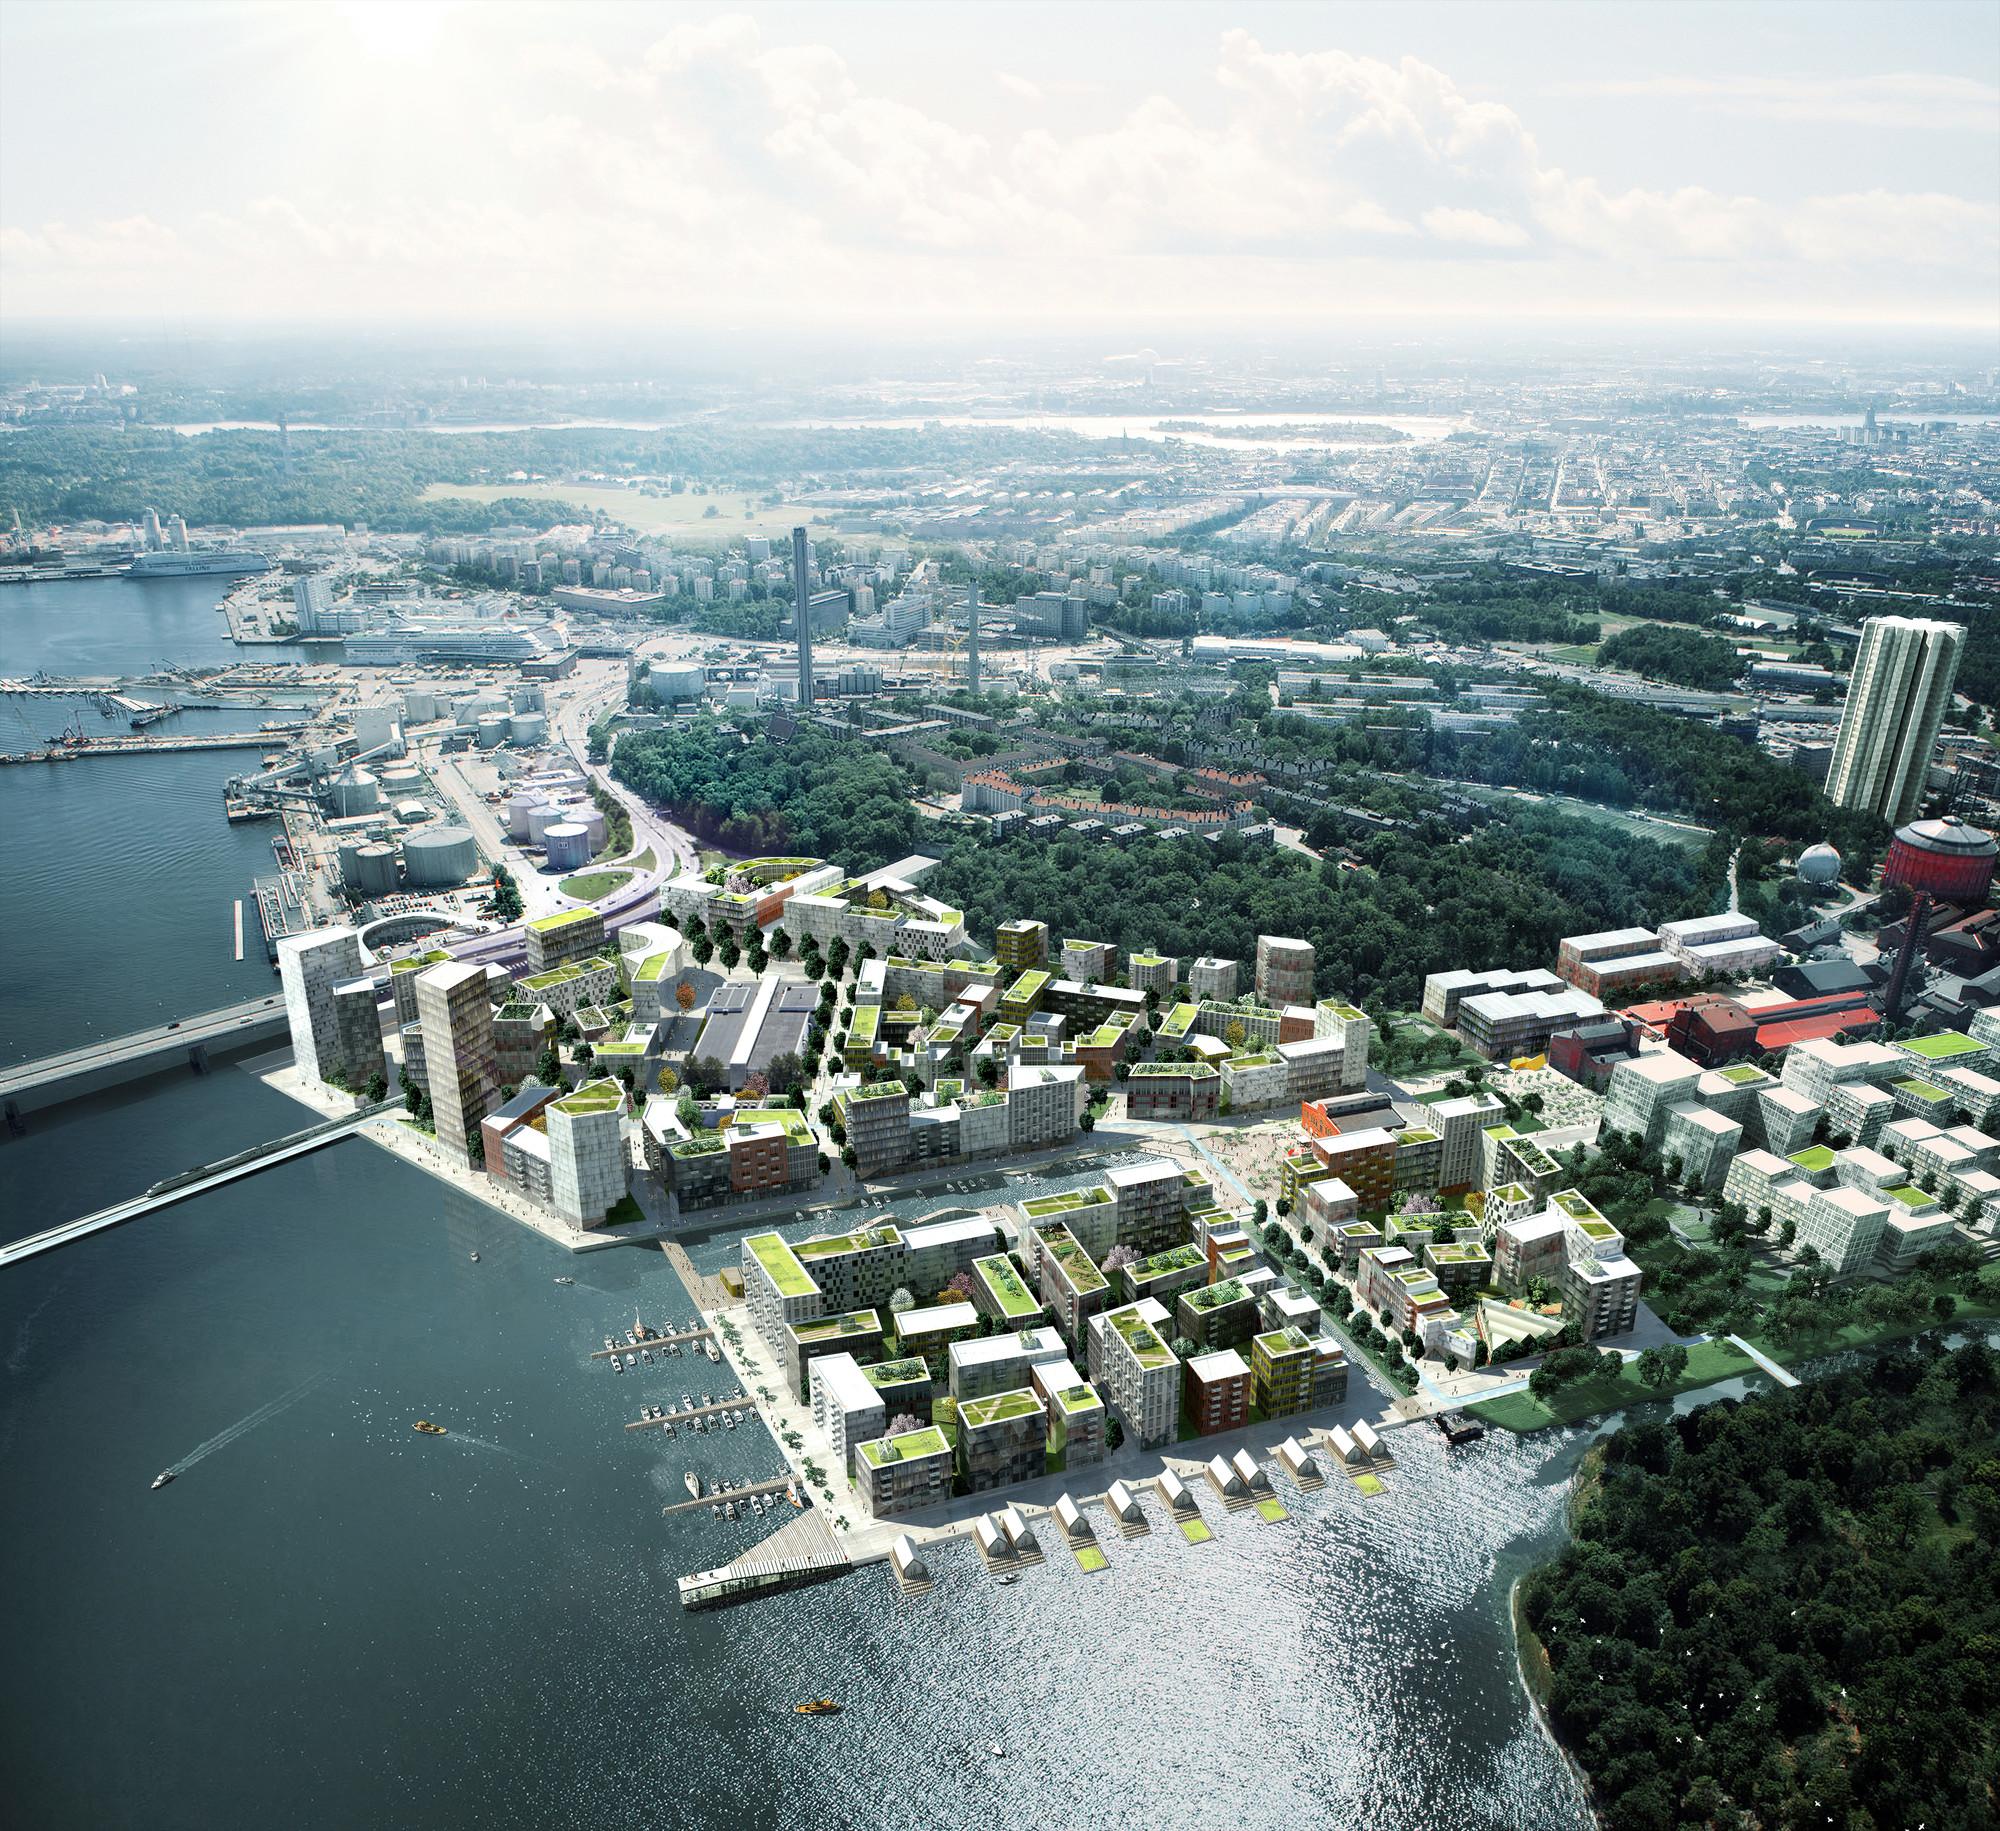 ADEPT and Mandaworks Design Masterplan for Stockholm's Royal Seaport, Birdseye view. Image Courtesy of ADEPT/Mandaworks